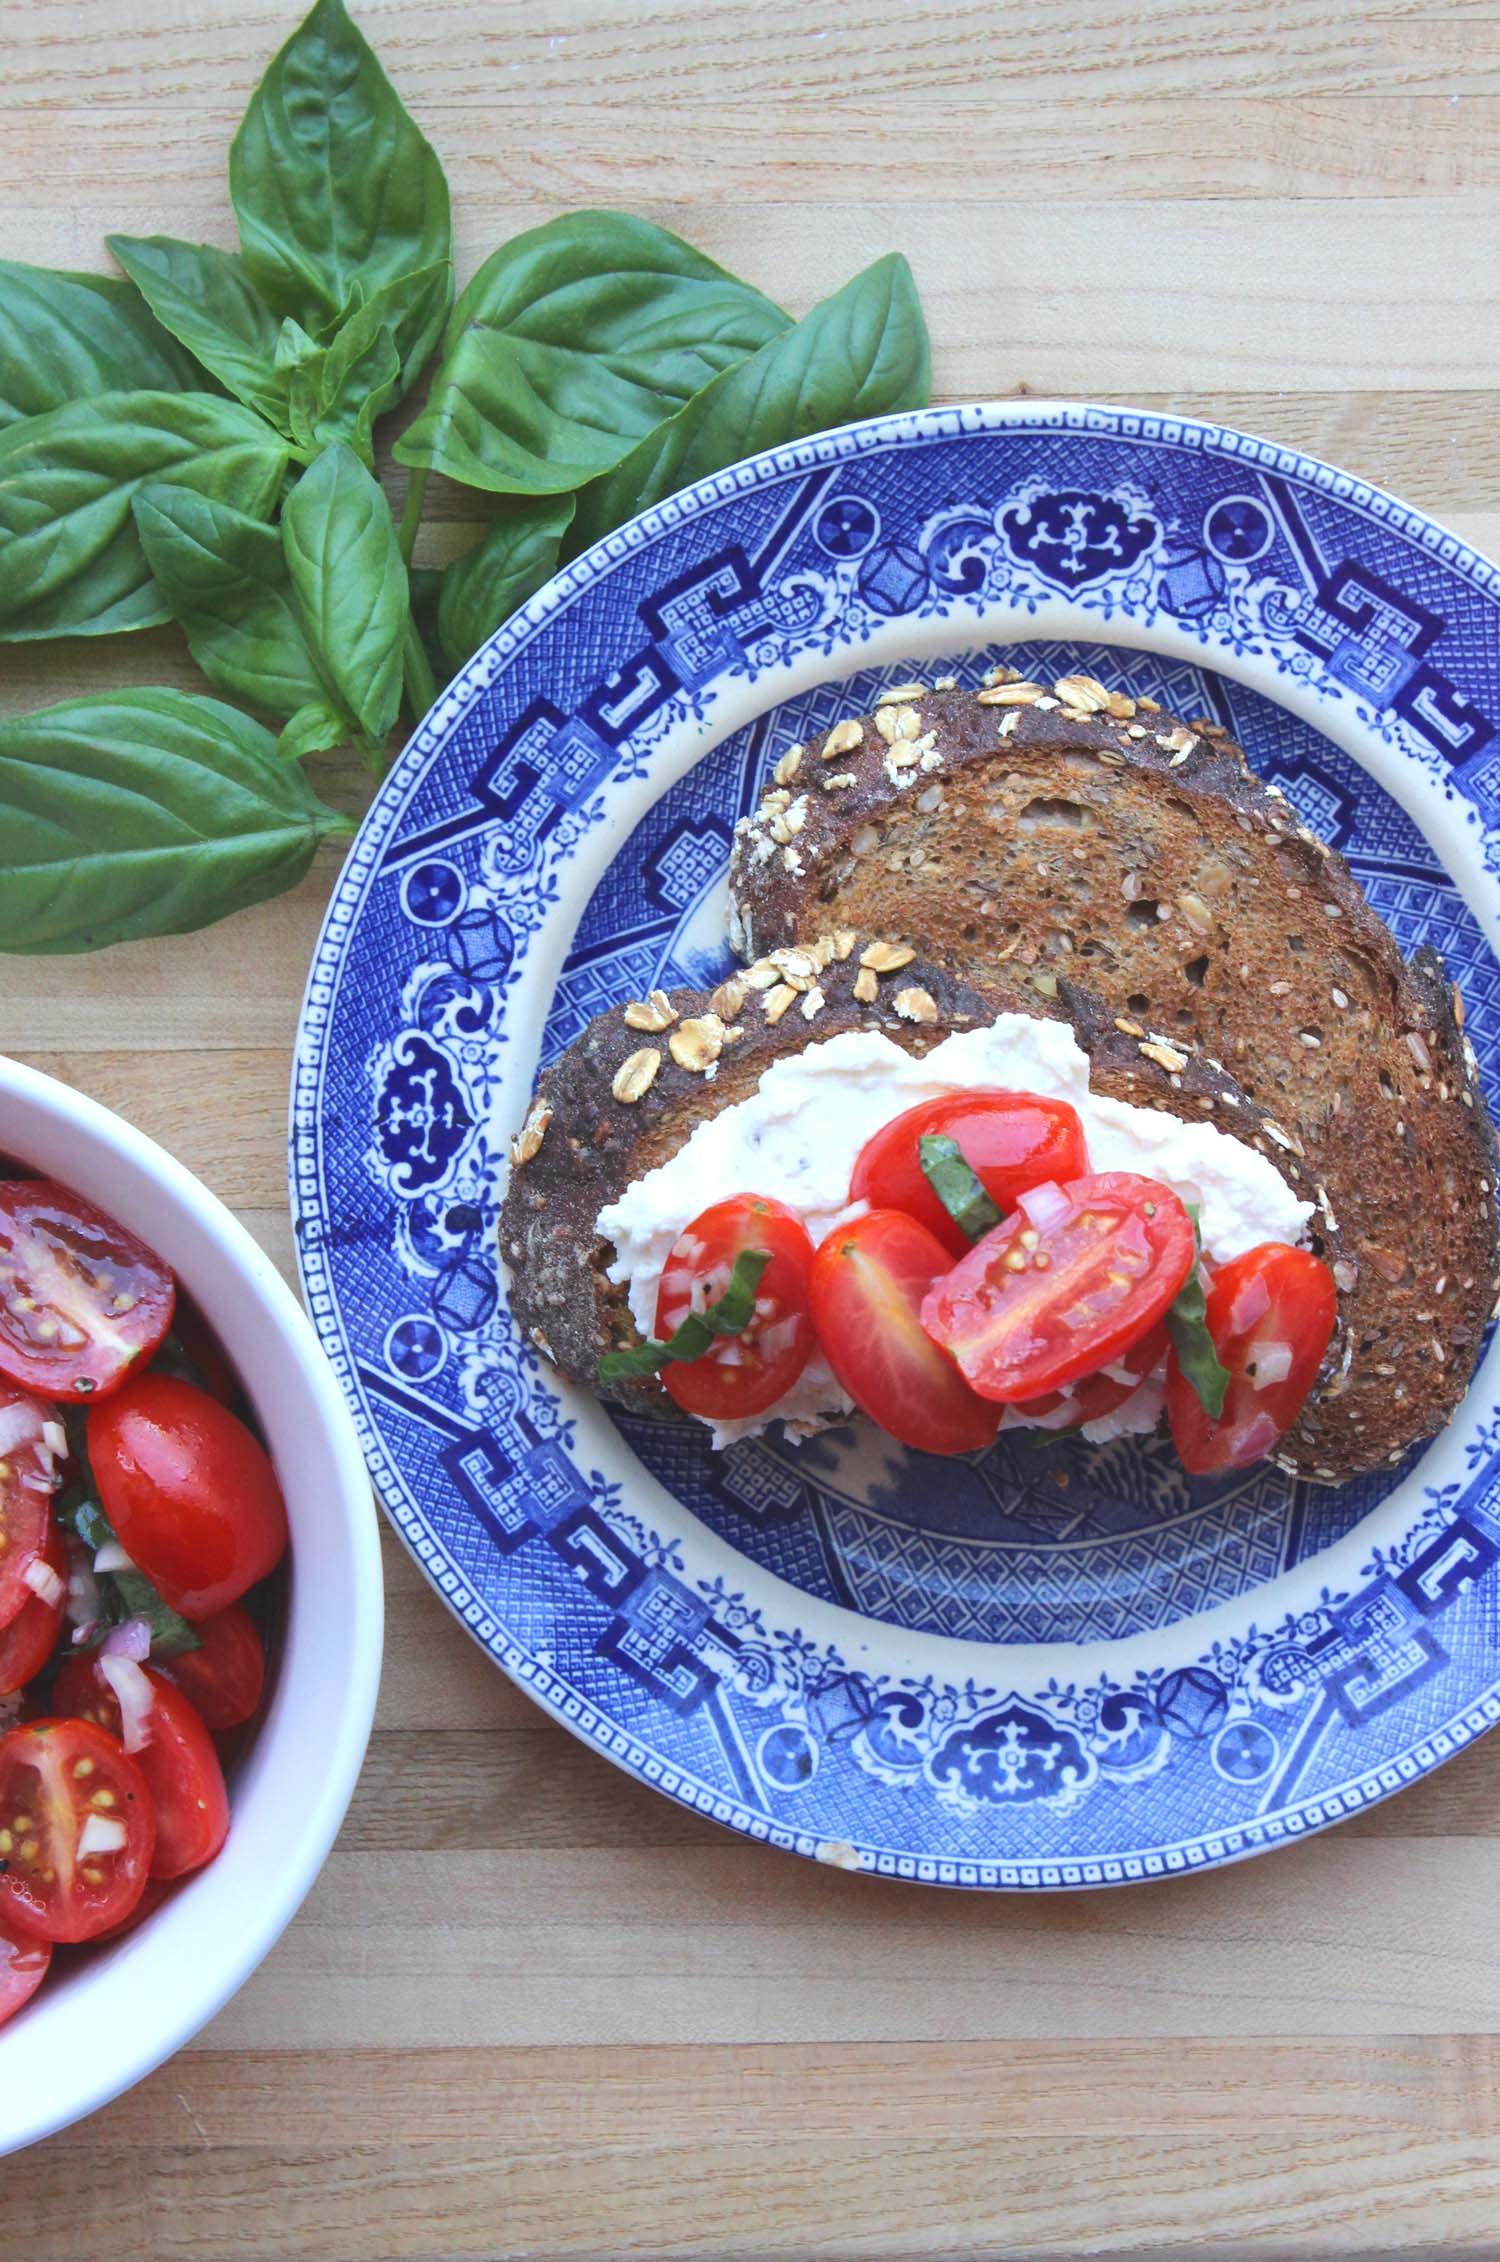 Tomato Crostini with Whipped Feta  | Image:  Laura Messersmith